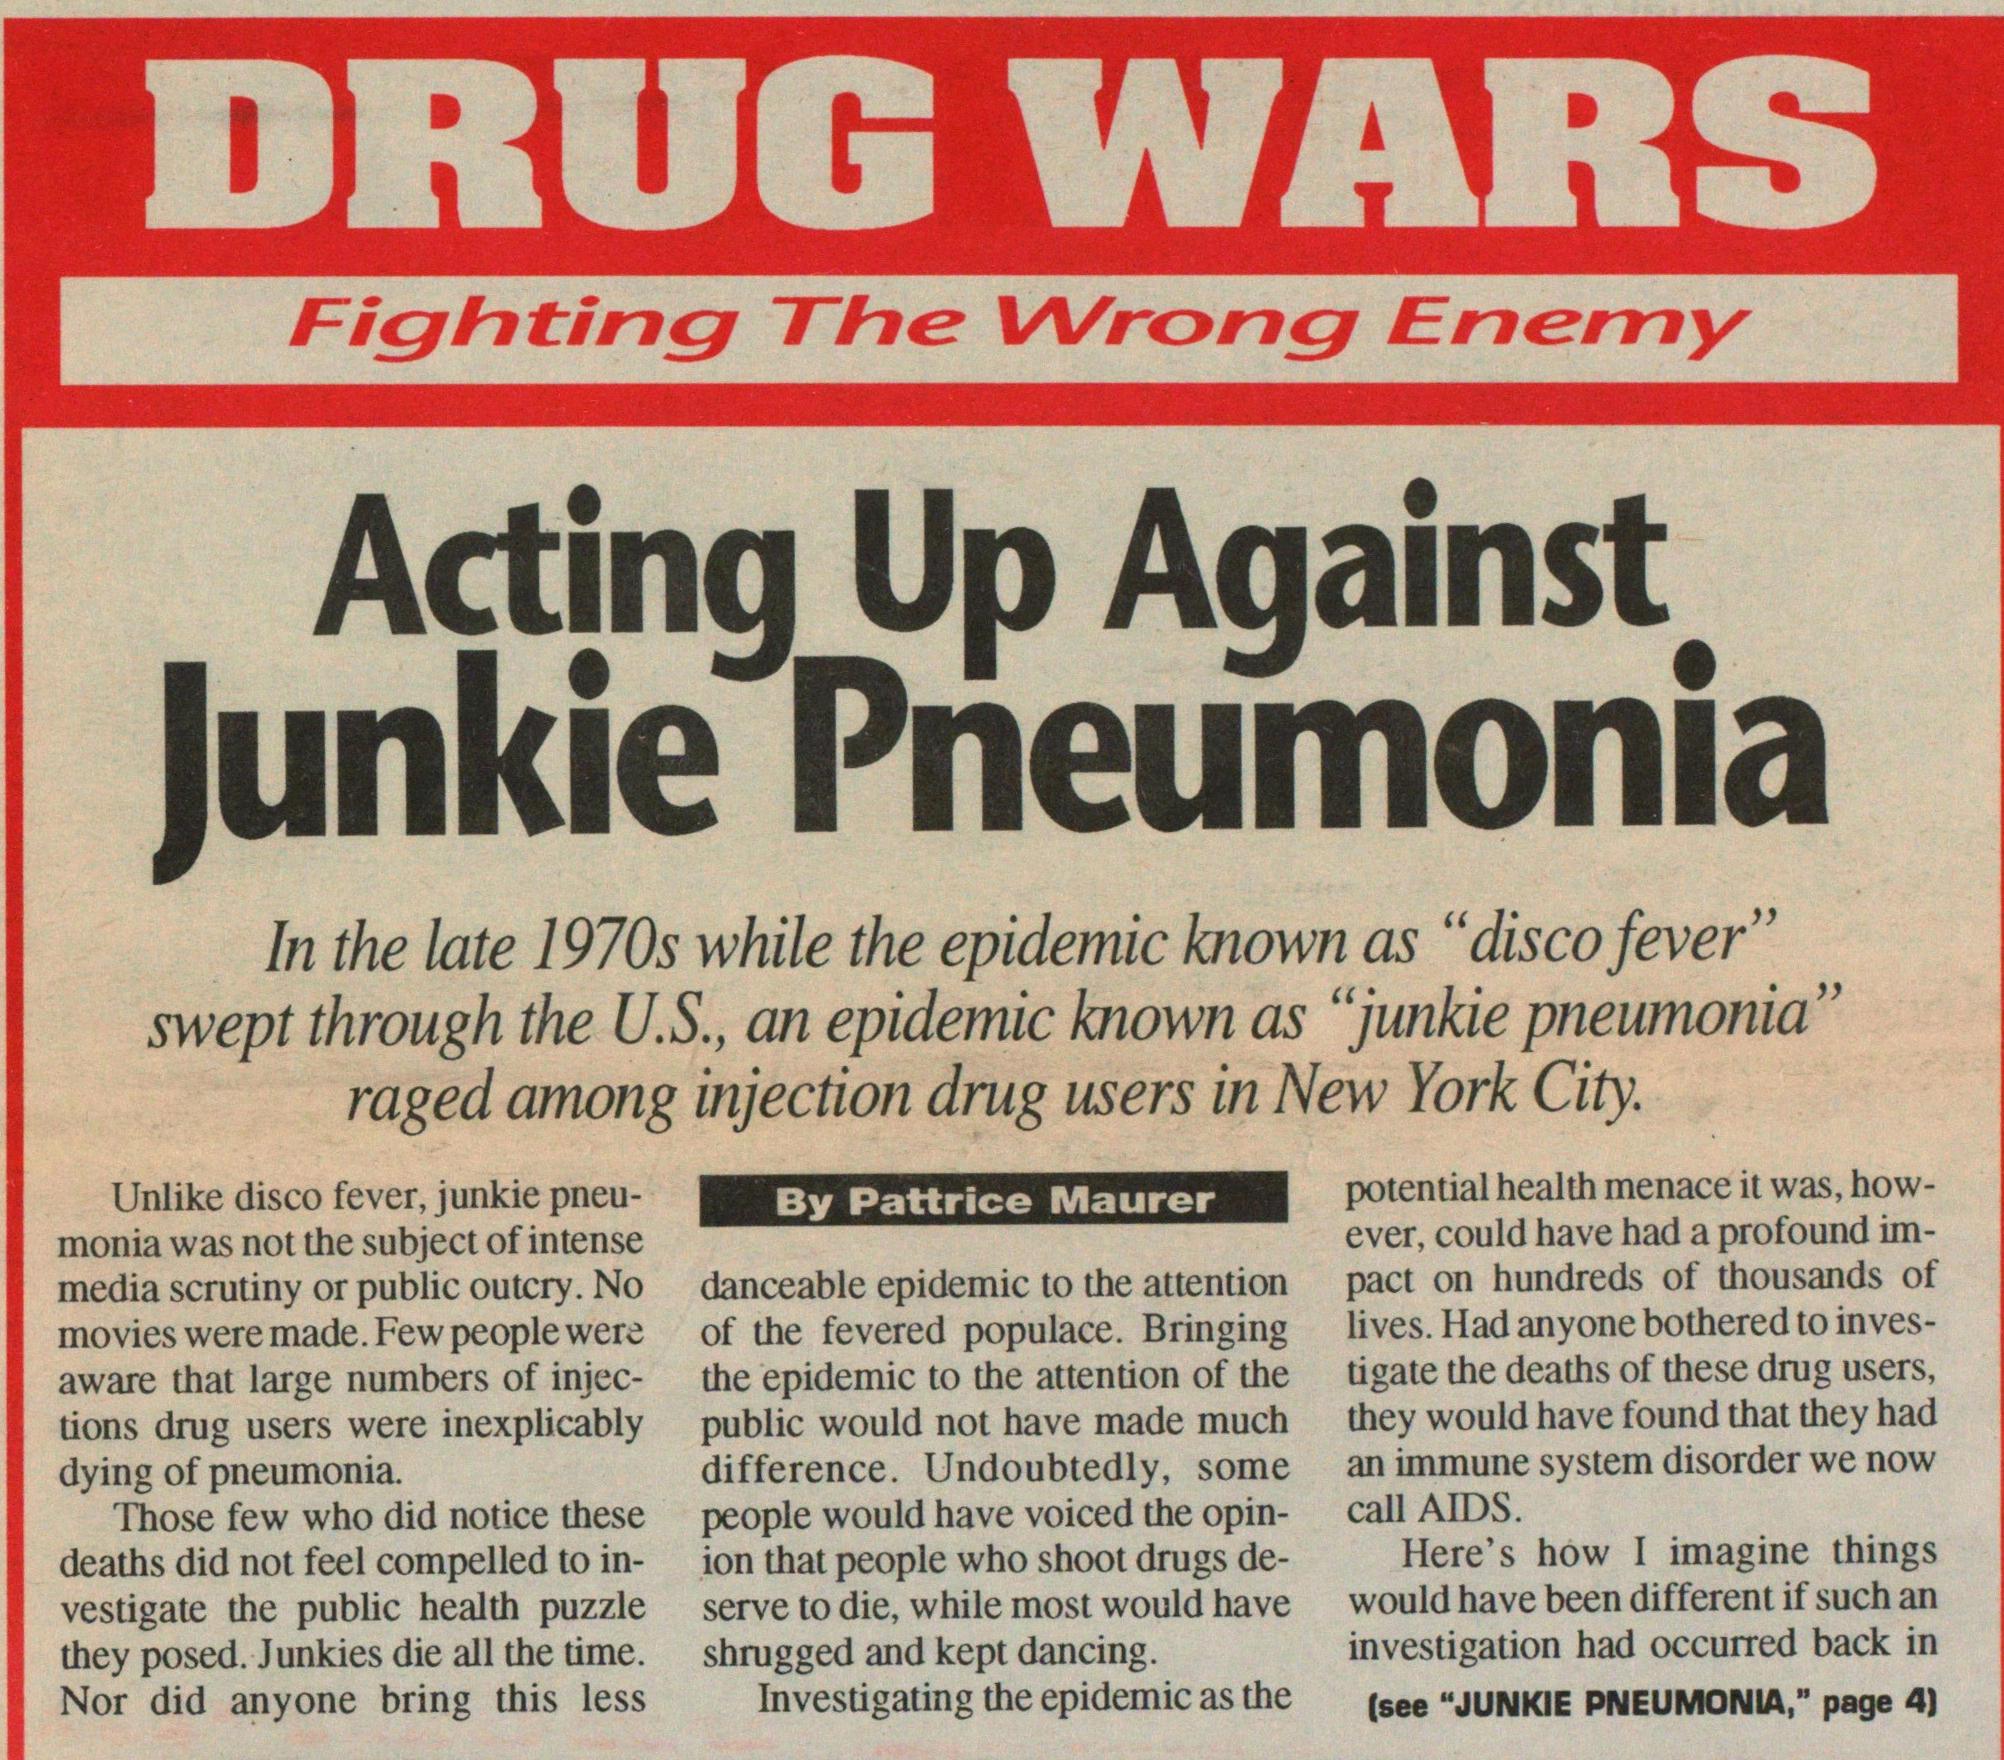 Acting Up Against Junkie Pneumonia image